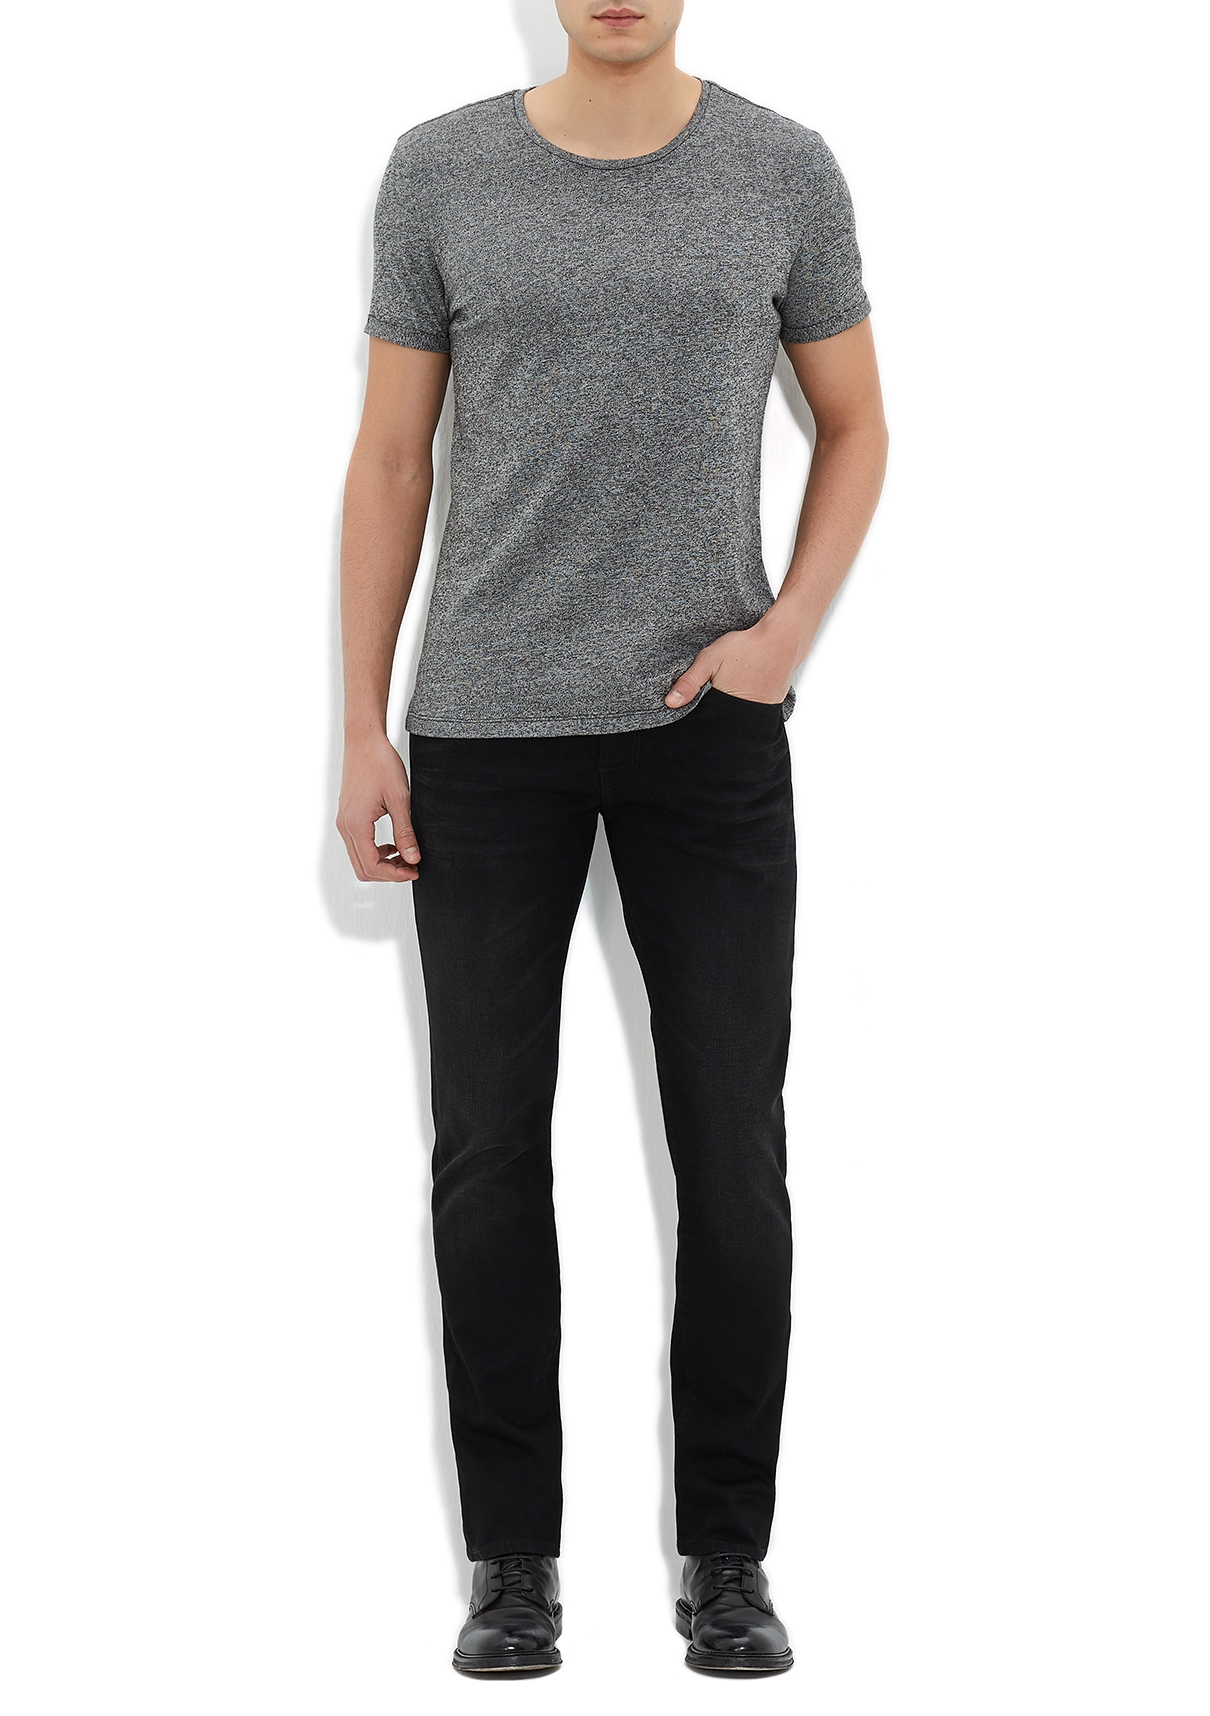 Mavi Jake Black Jean Klasik Pantolon 28-30 5000133843021 Ürün Resmi